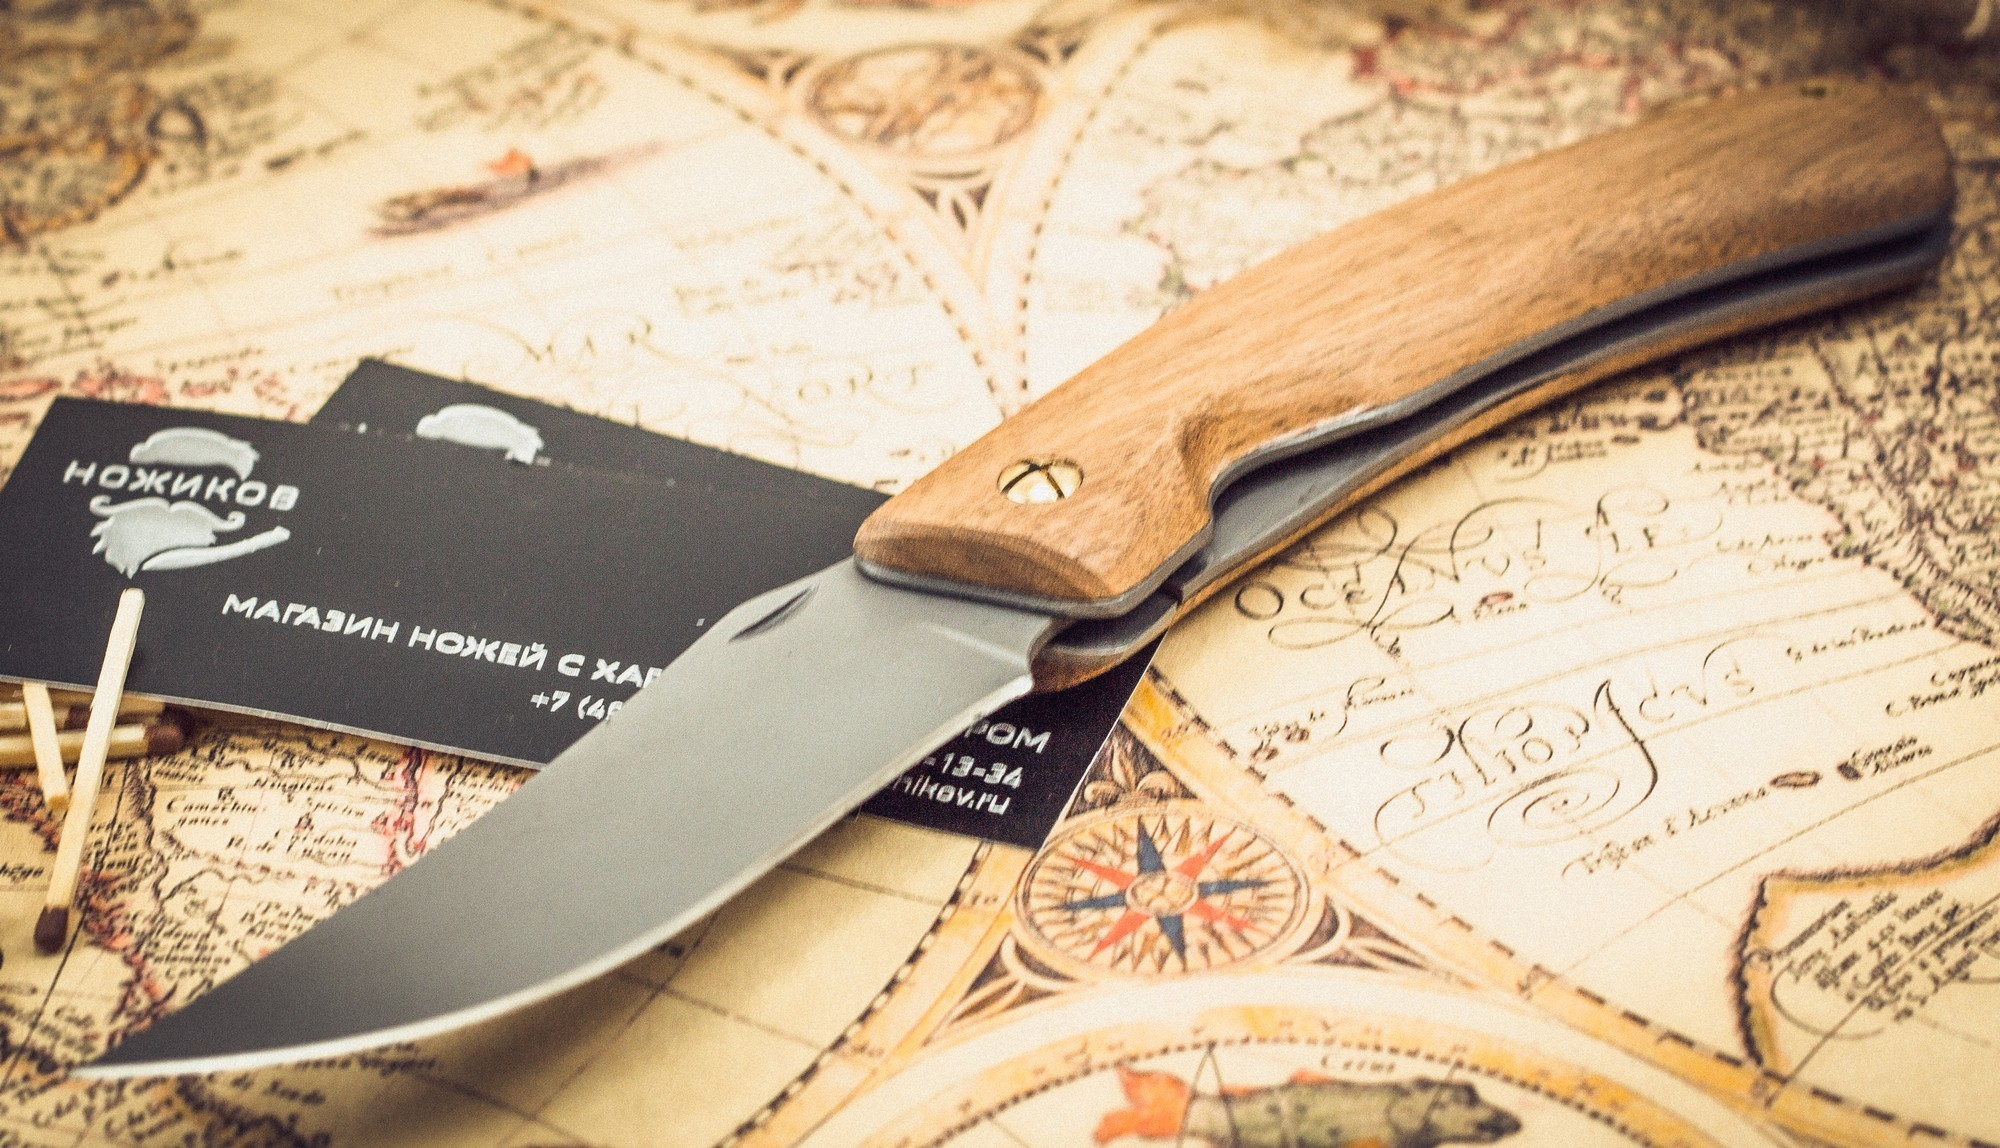 Фото 5 - Складные ножи Косач , сталь 95Х18 от Марычев